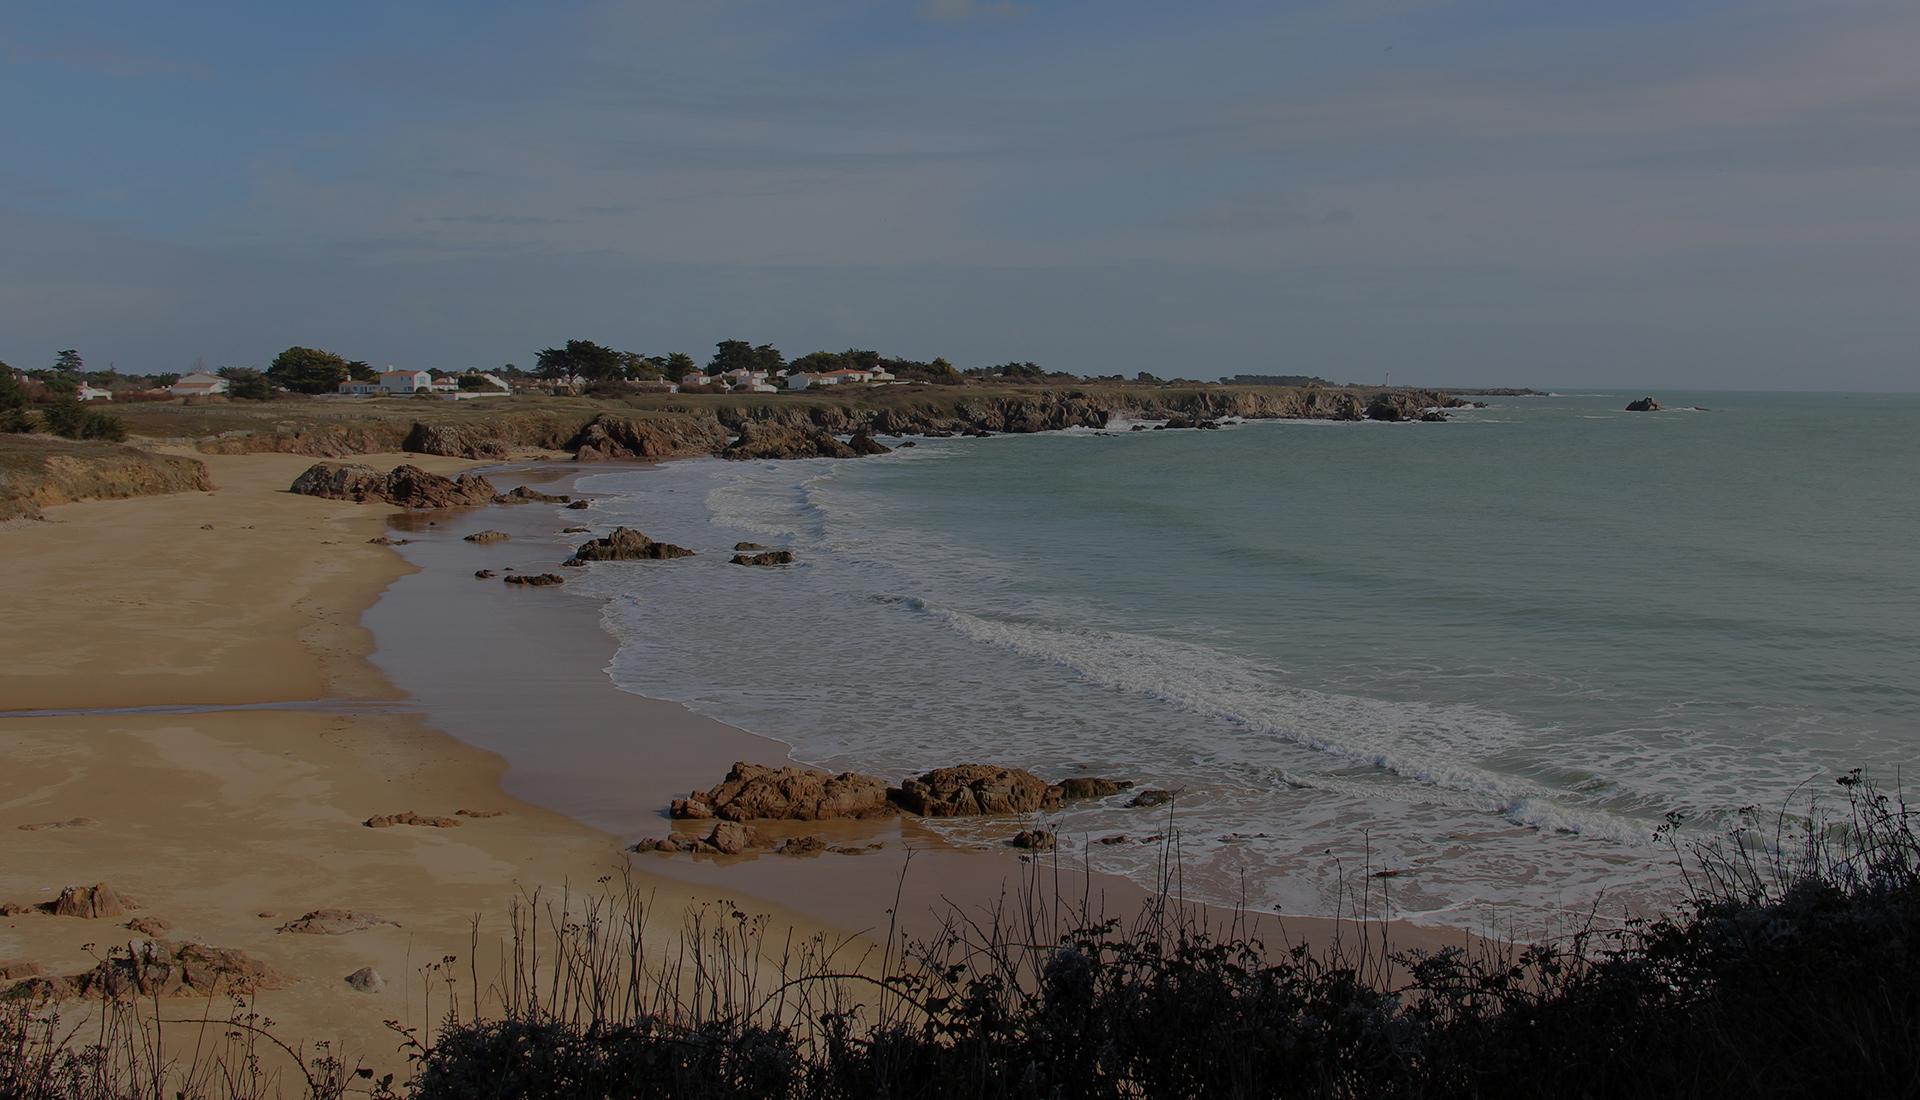 Plage de l'océan atlantique avec sa nature